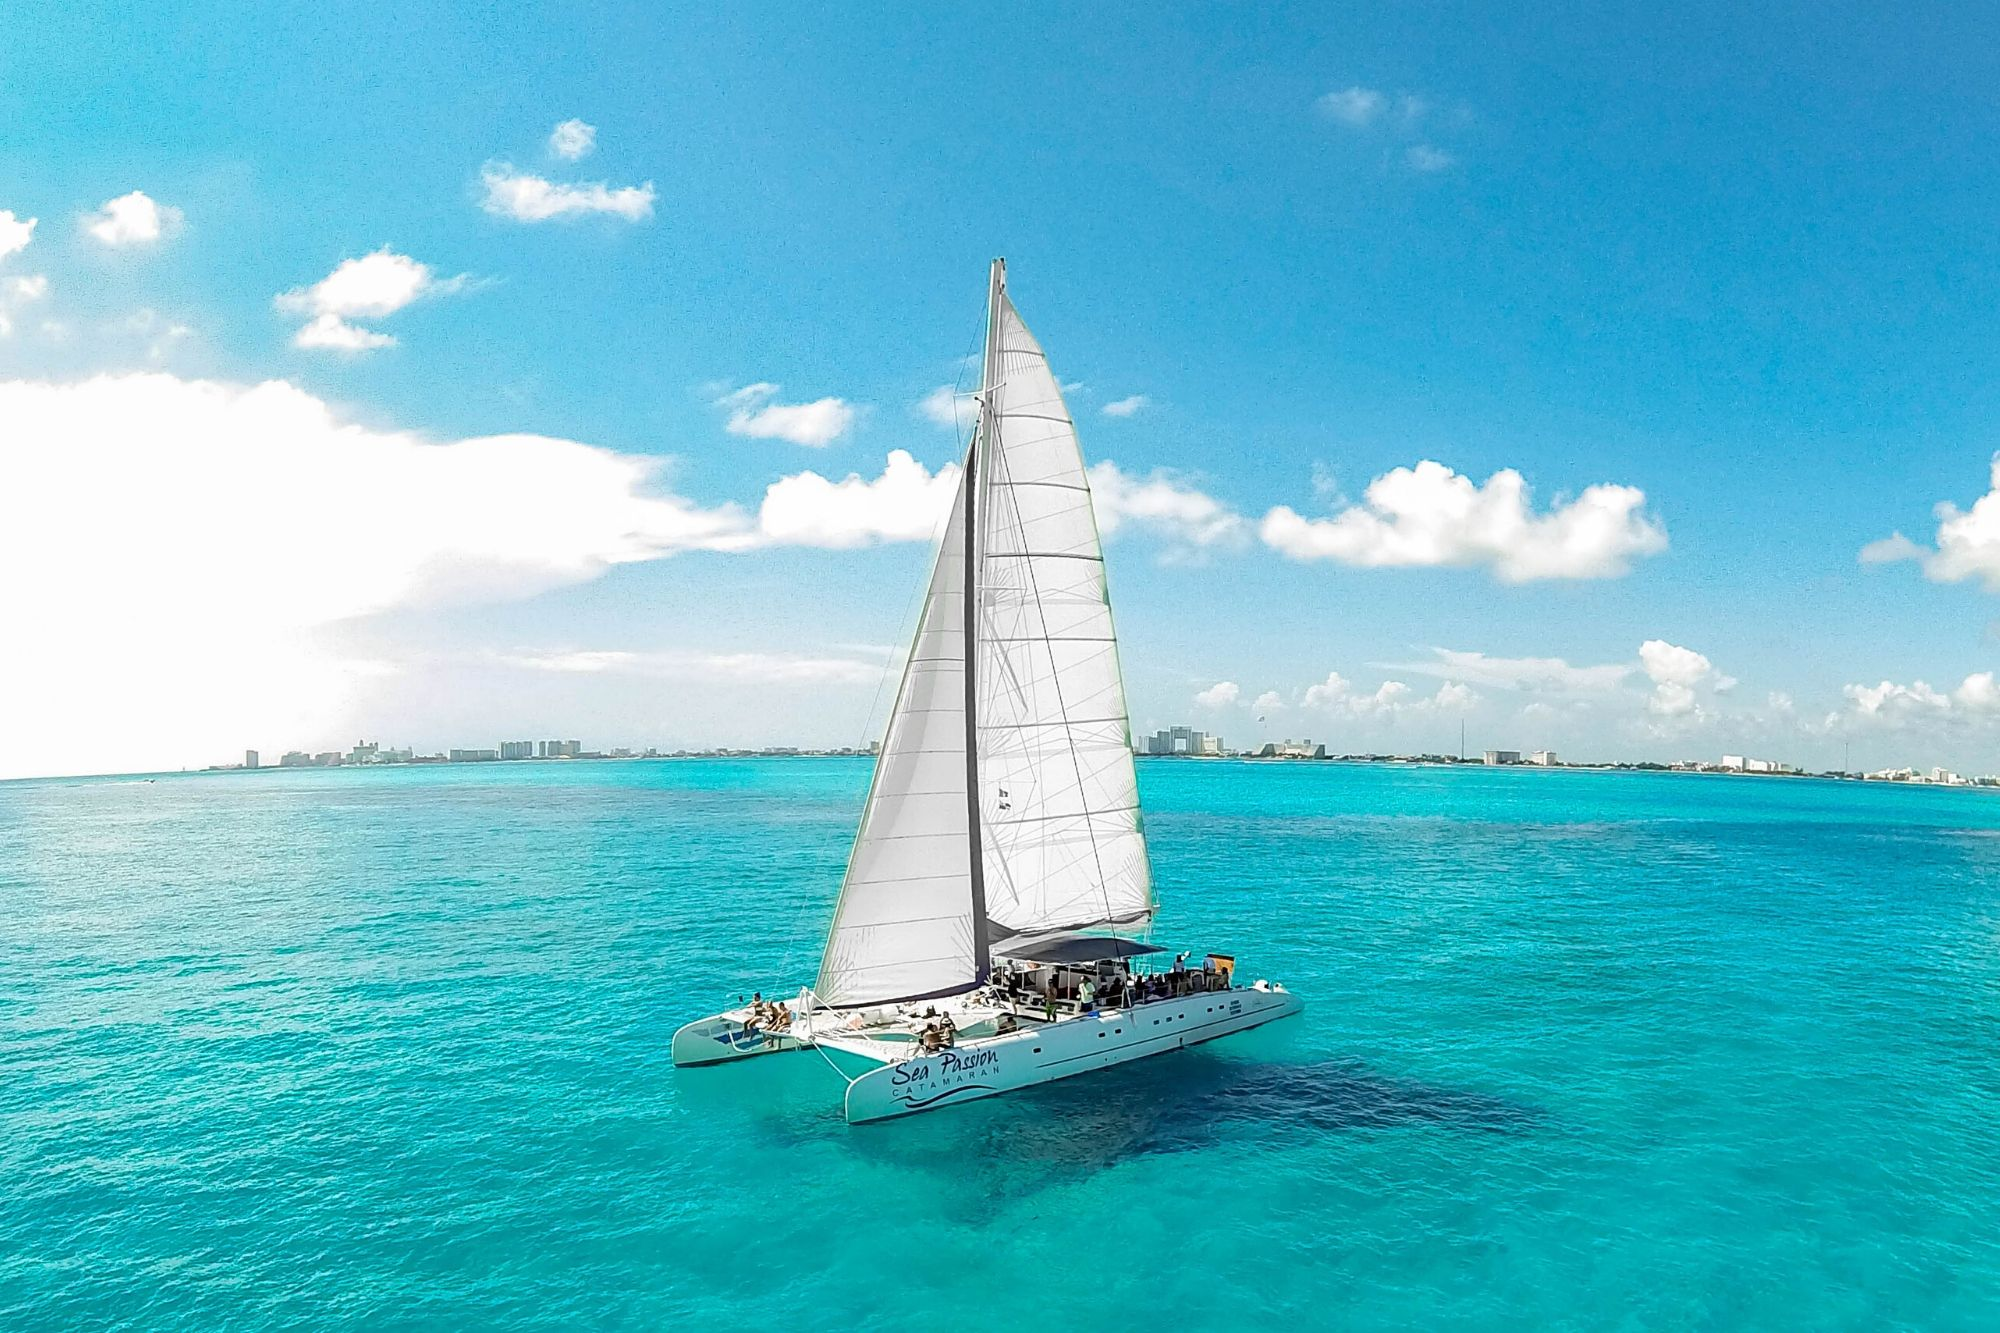 6 Private Isla Mujeres tour in catamaran - Sea Passion I II - Cancun Sailing